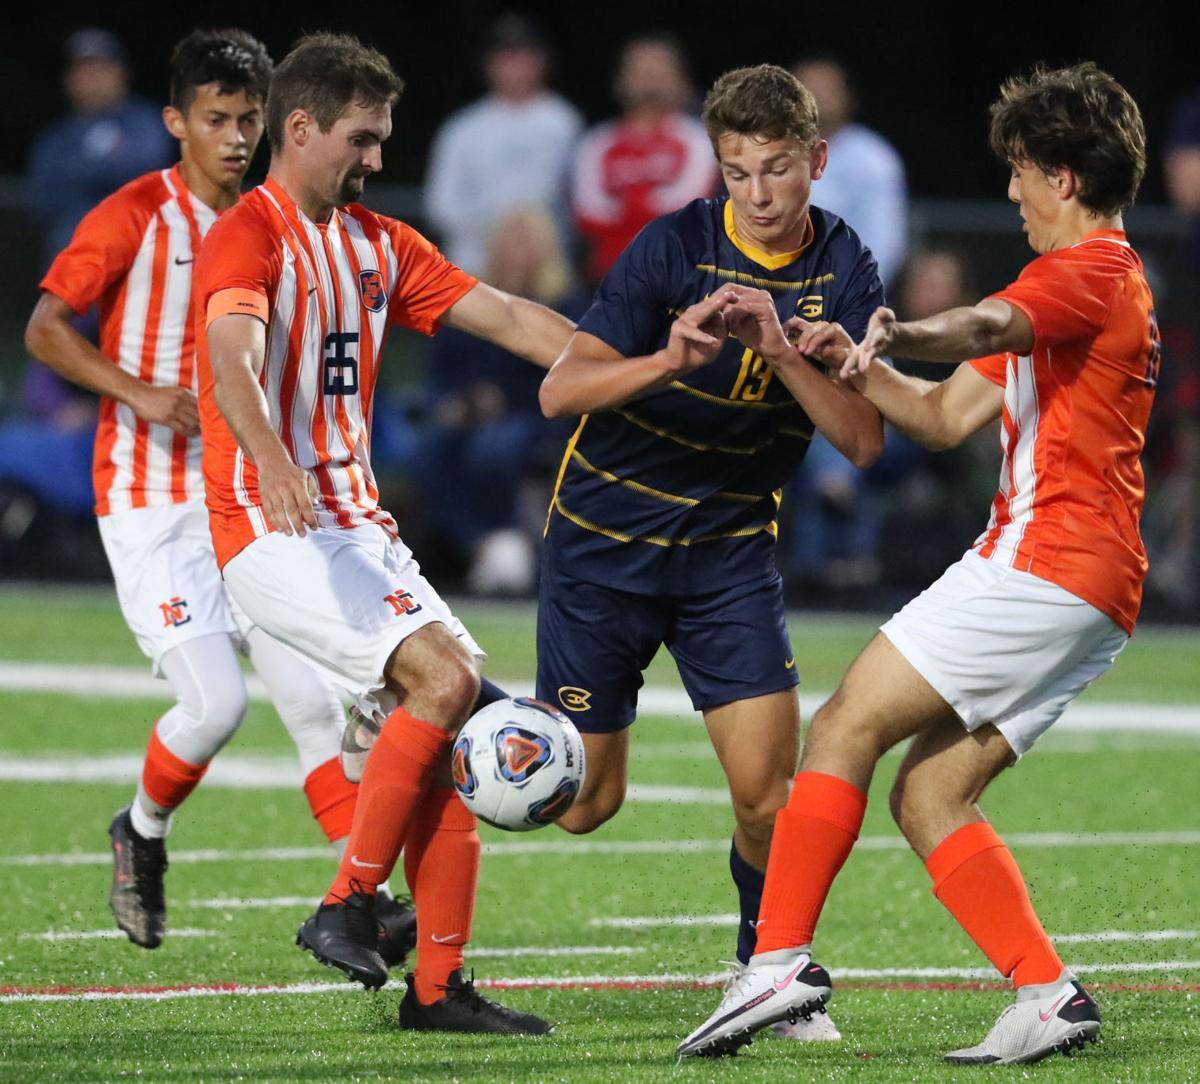 Northland College at UW-Eau Claire men's soccer